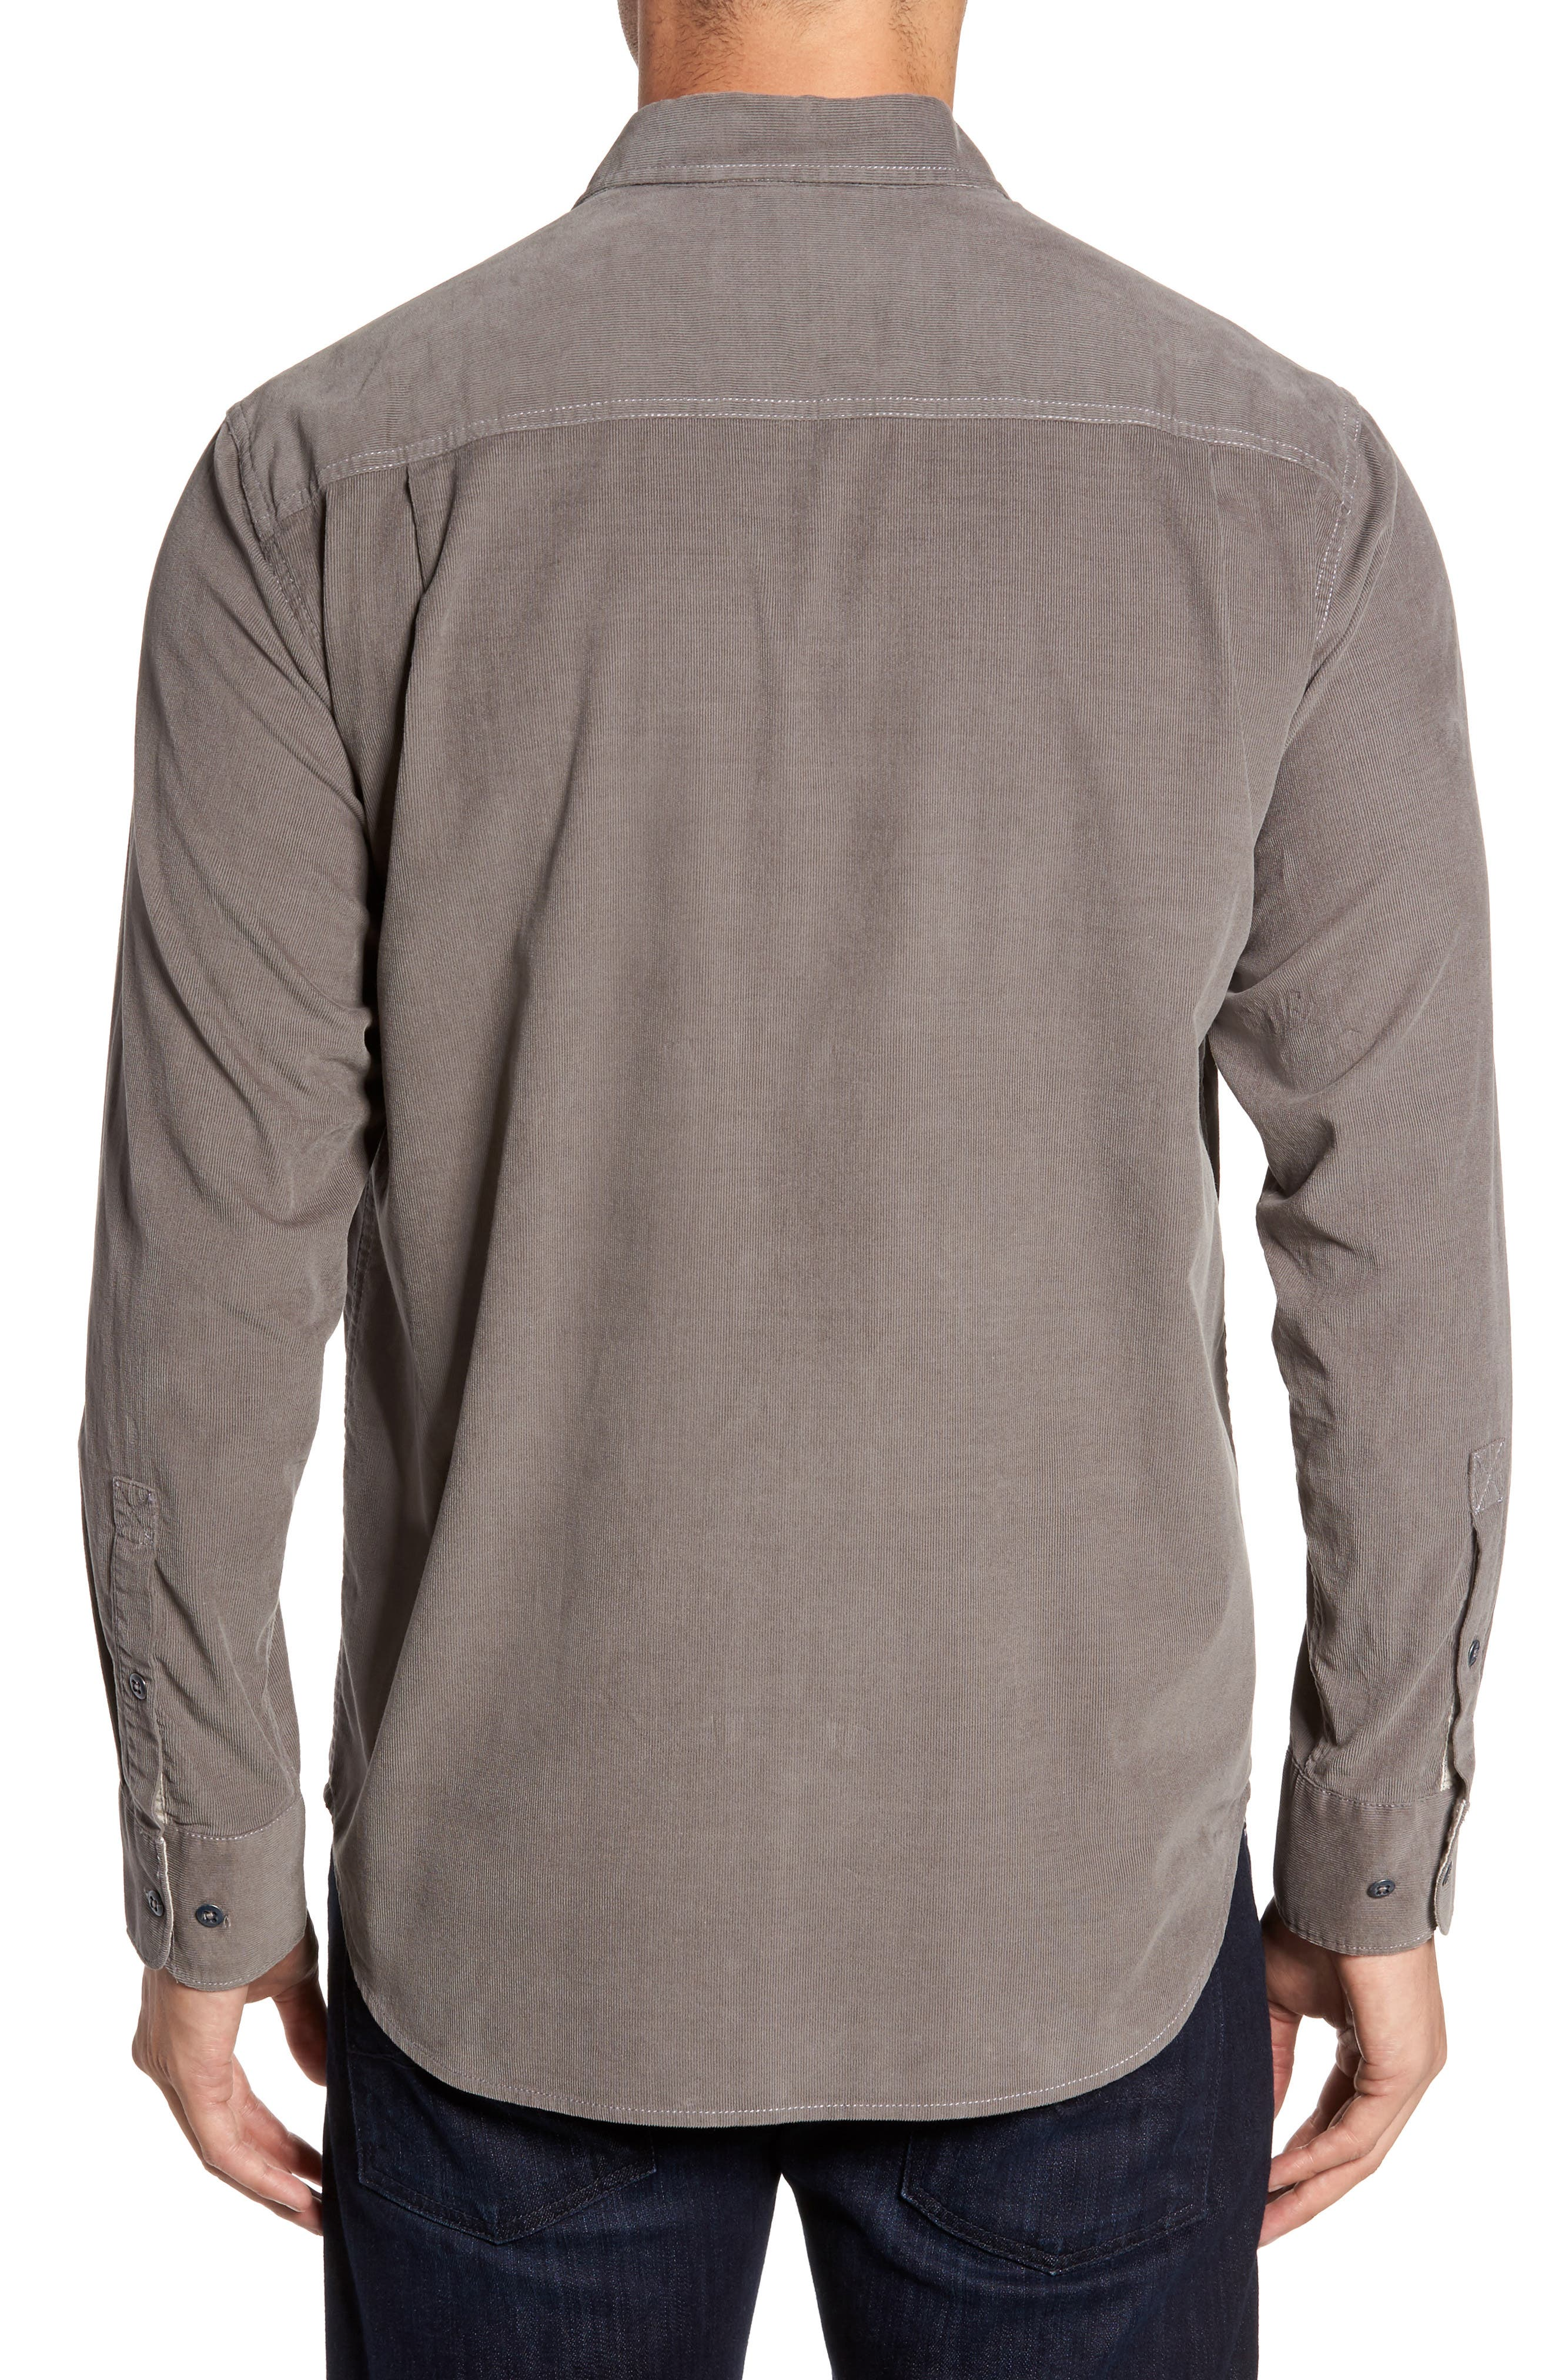 Harrison Cord Standard Fit Shirt,                             Alternate thumbnail 2, color,                             050